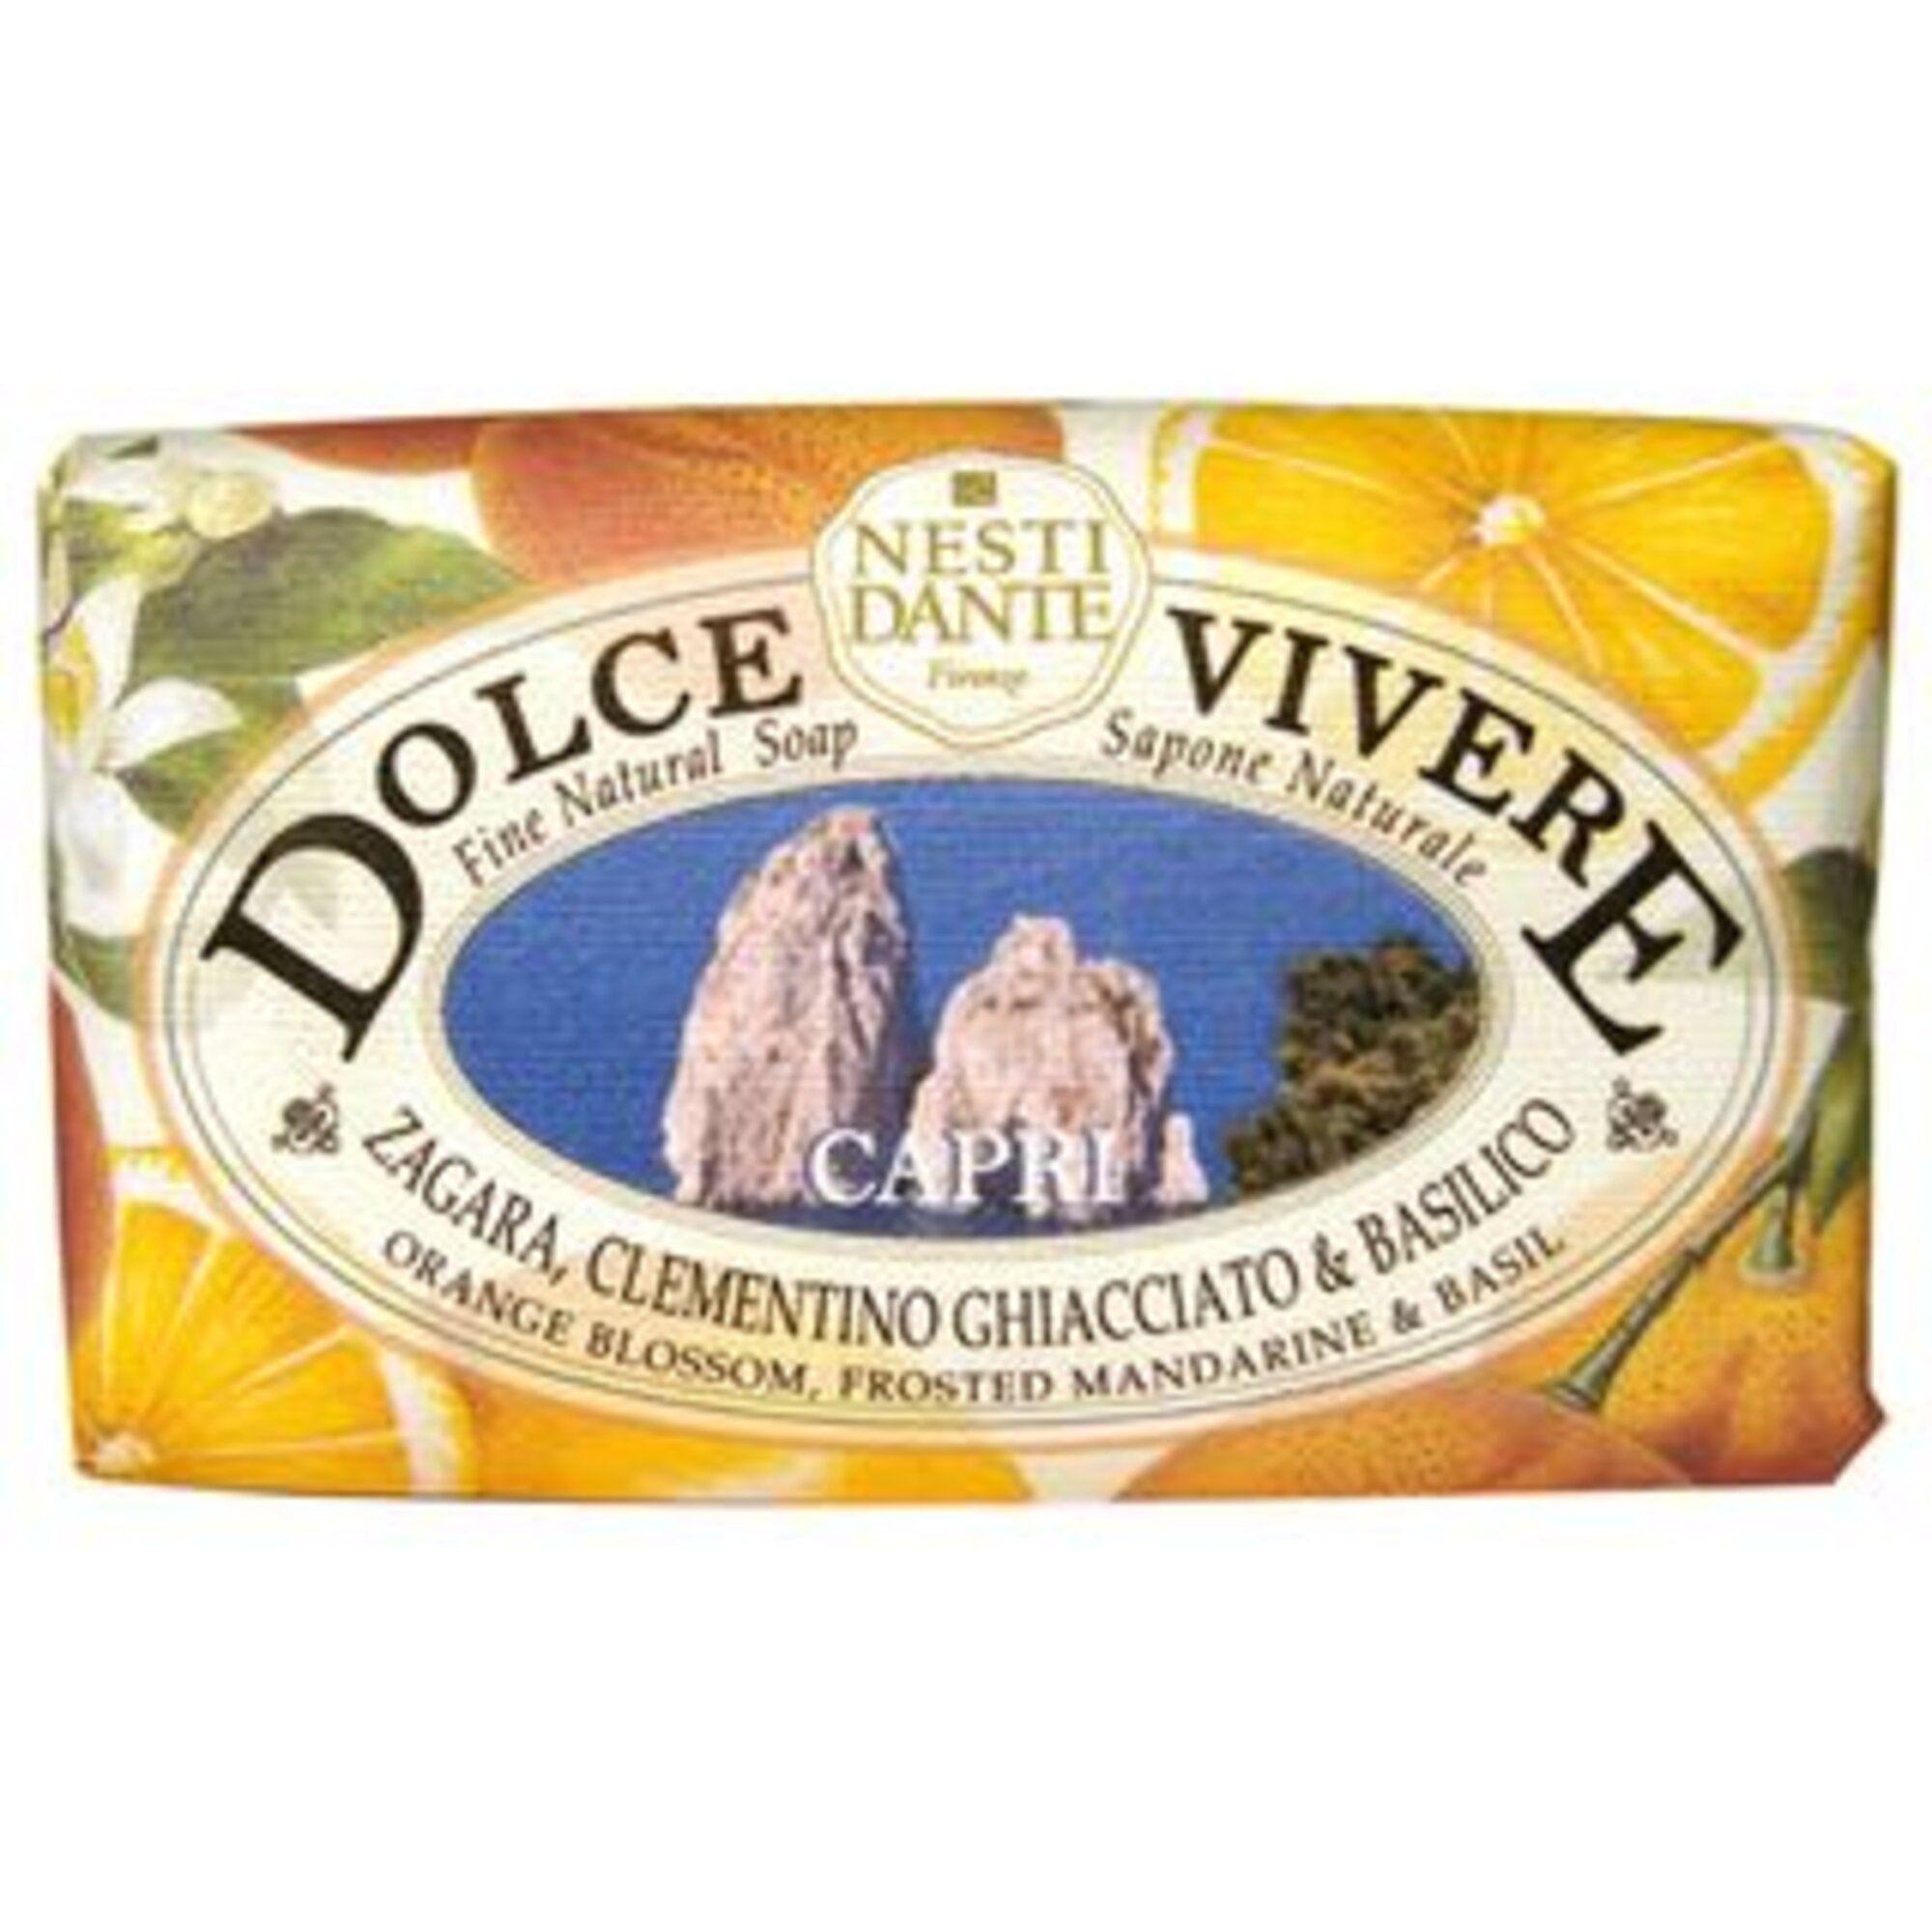 Sabonete Dolce Vivere Capri 250g Nesti Dante